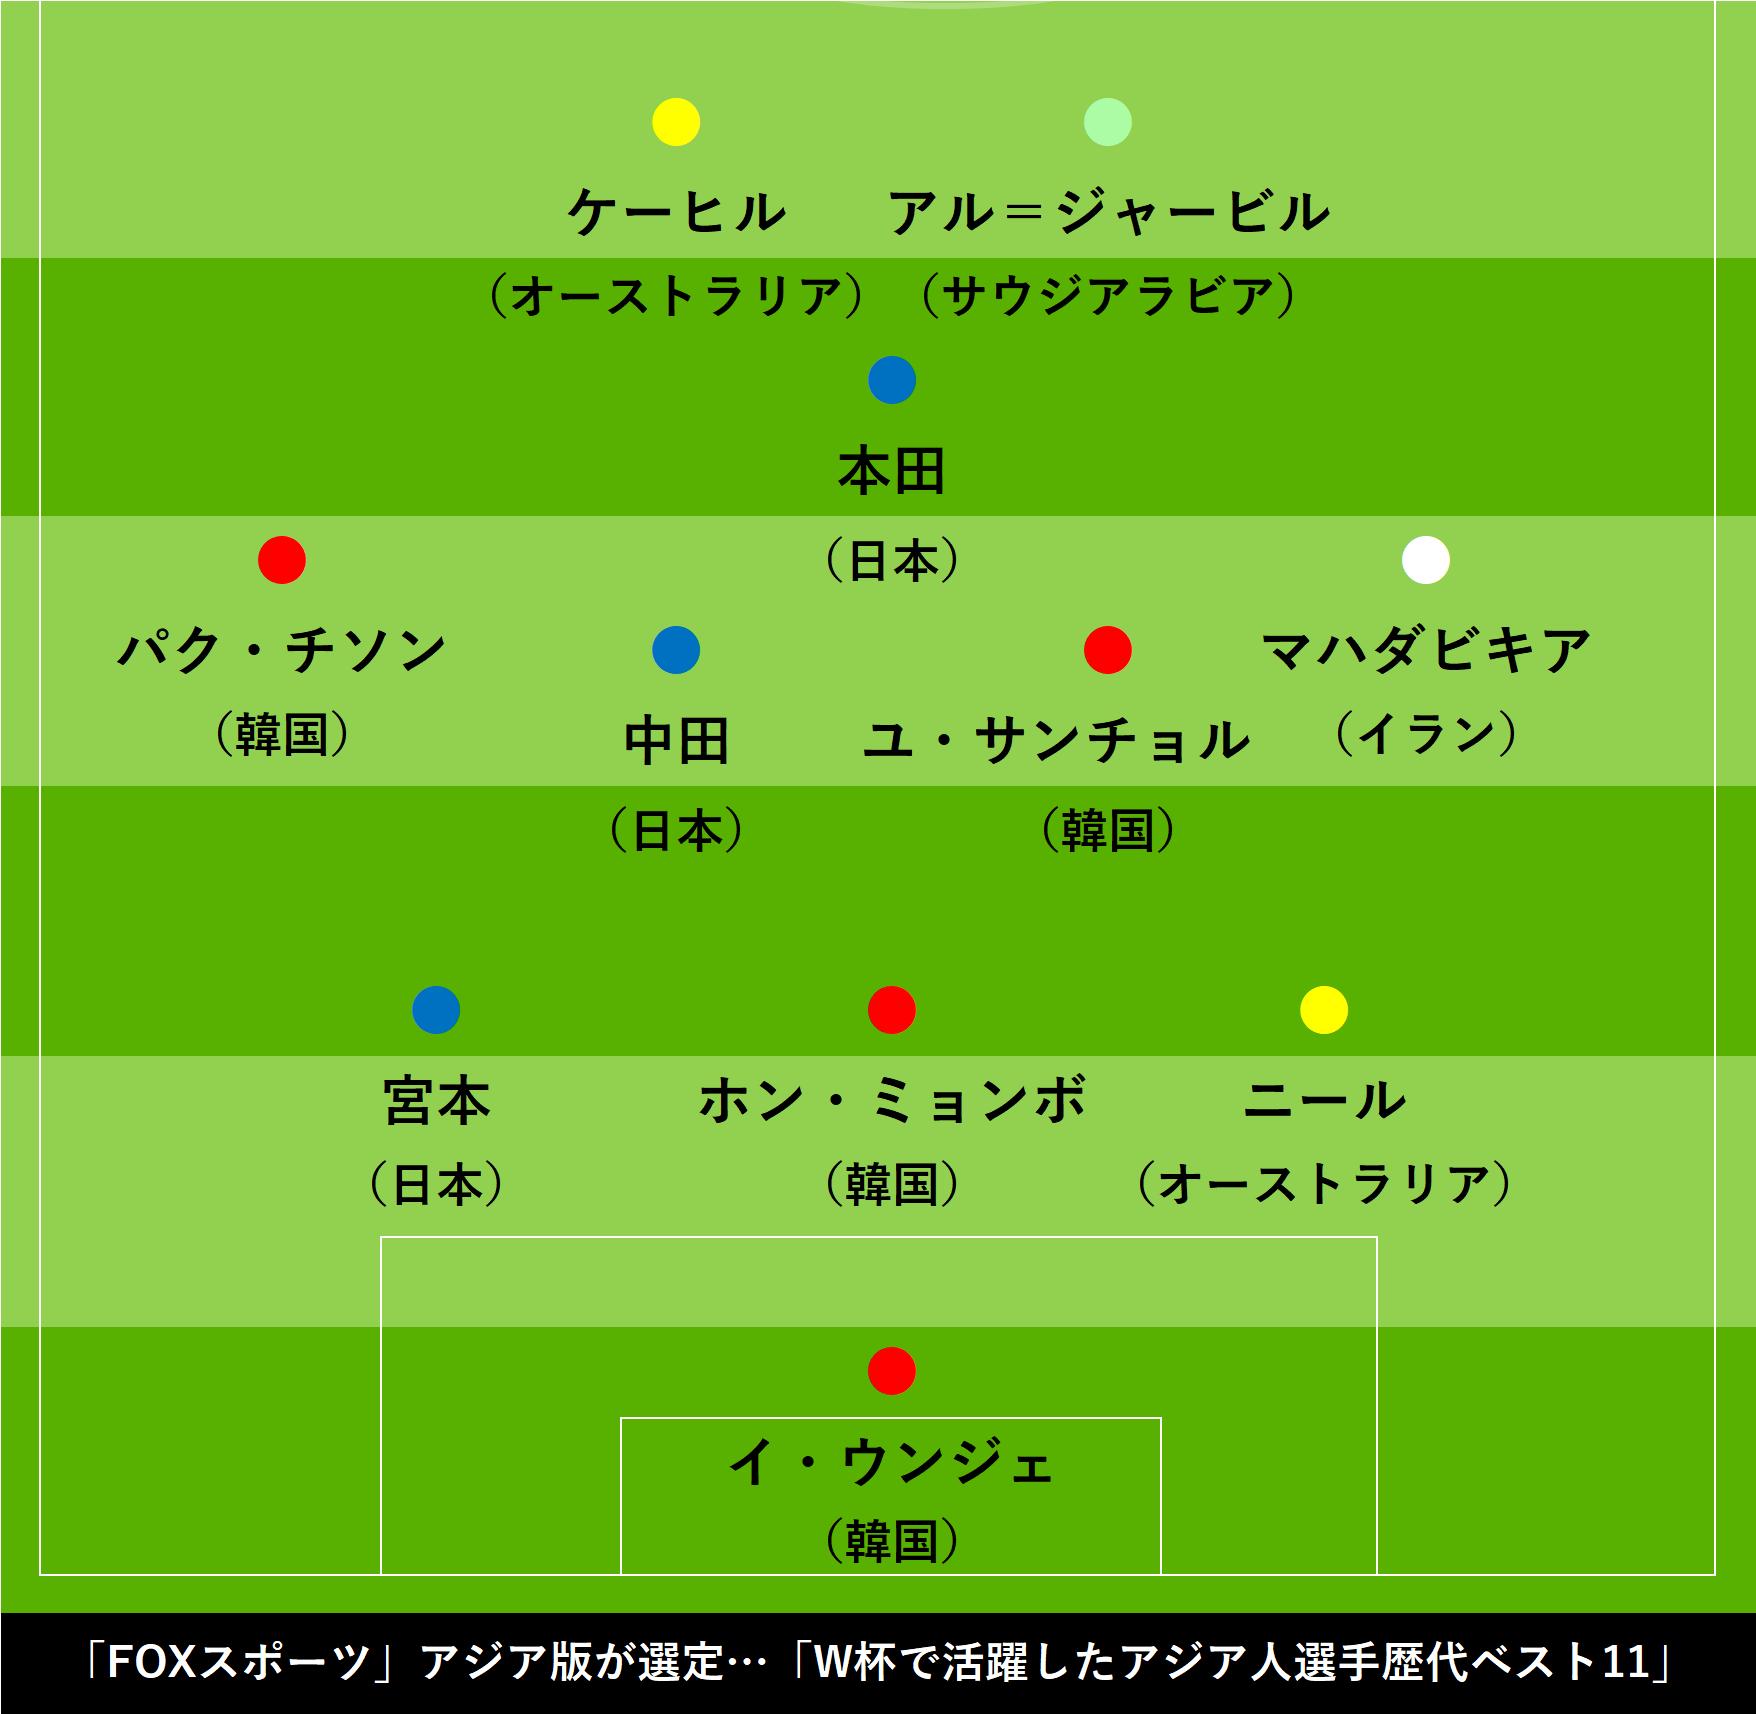 「FOXスポーツ」アジア版が選定「W杯で活躍したアジア人選手歴代ベスト11」【画像:Football ZONE web】